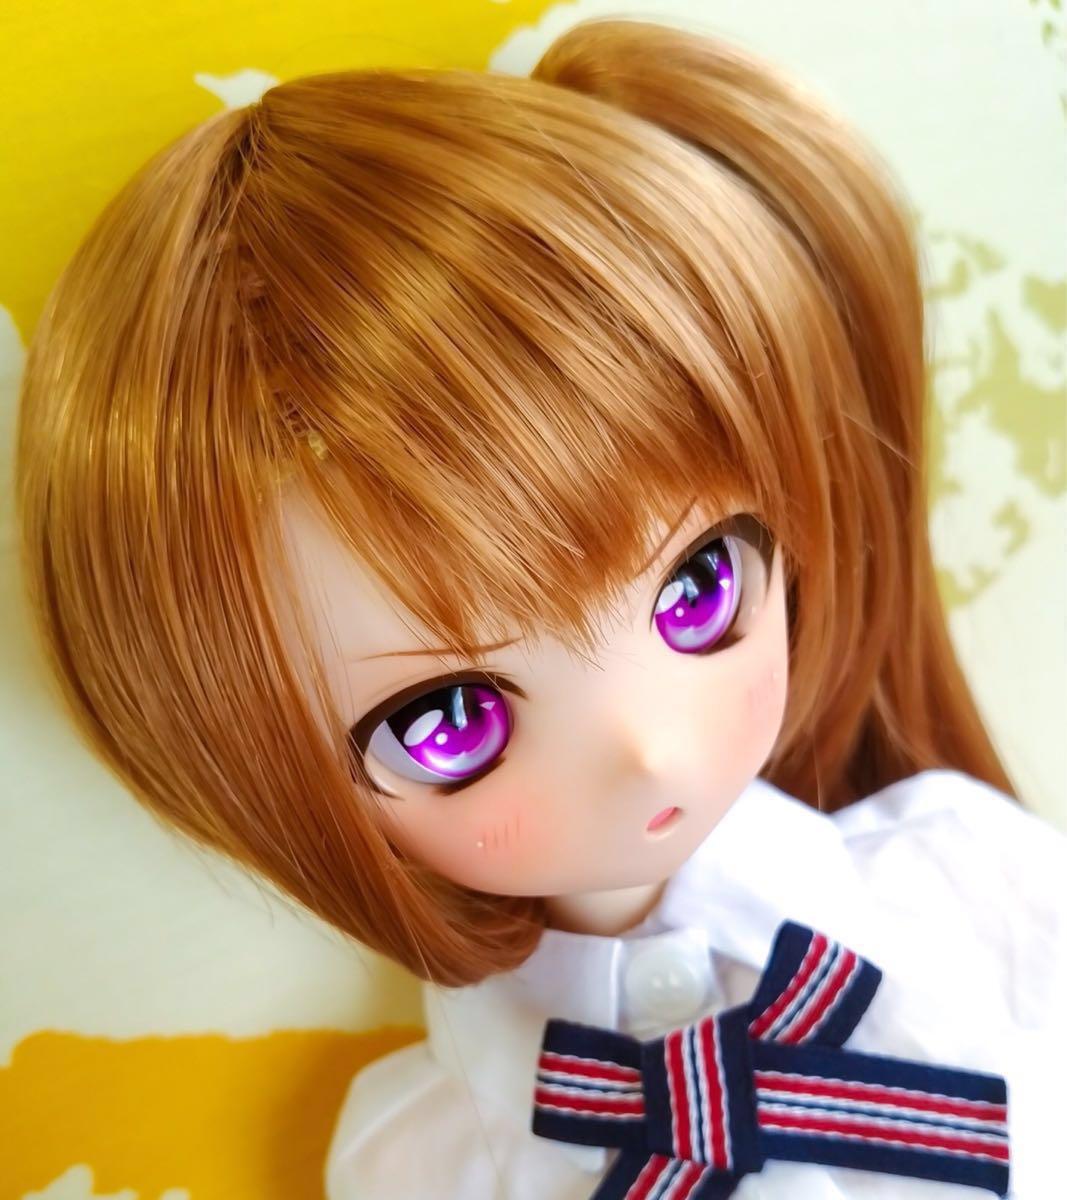 【Cube。】No.59 DDH-01 ノーマル肌 カスタムヘッド+アイ_画像9